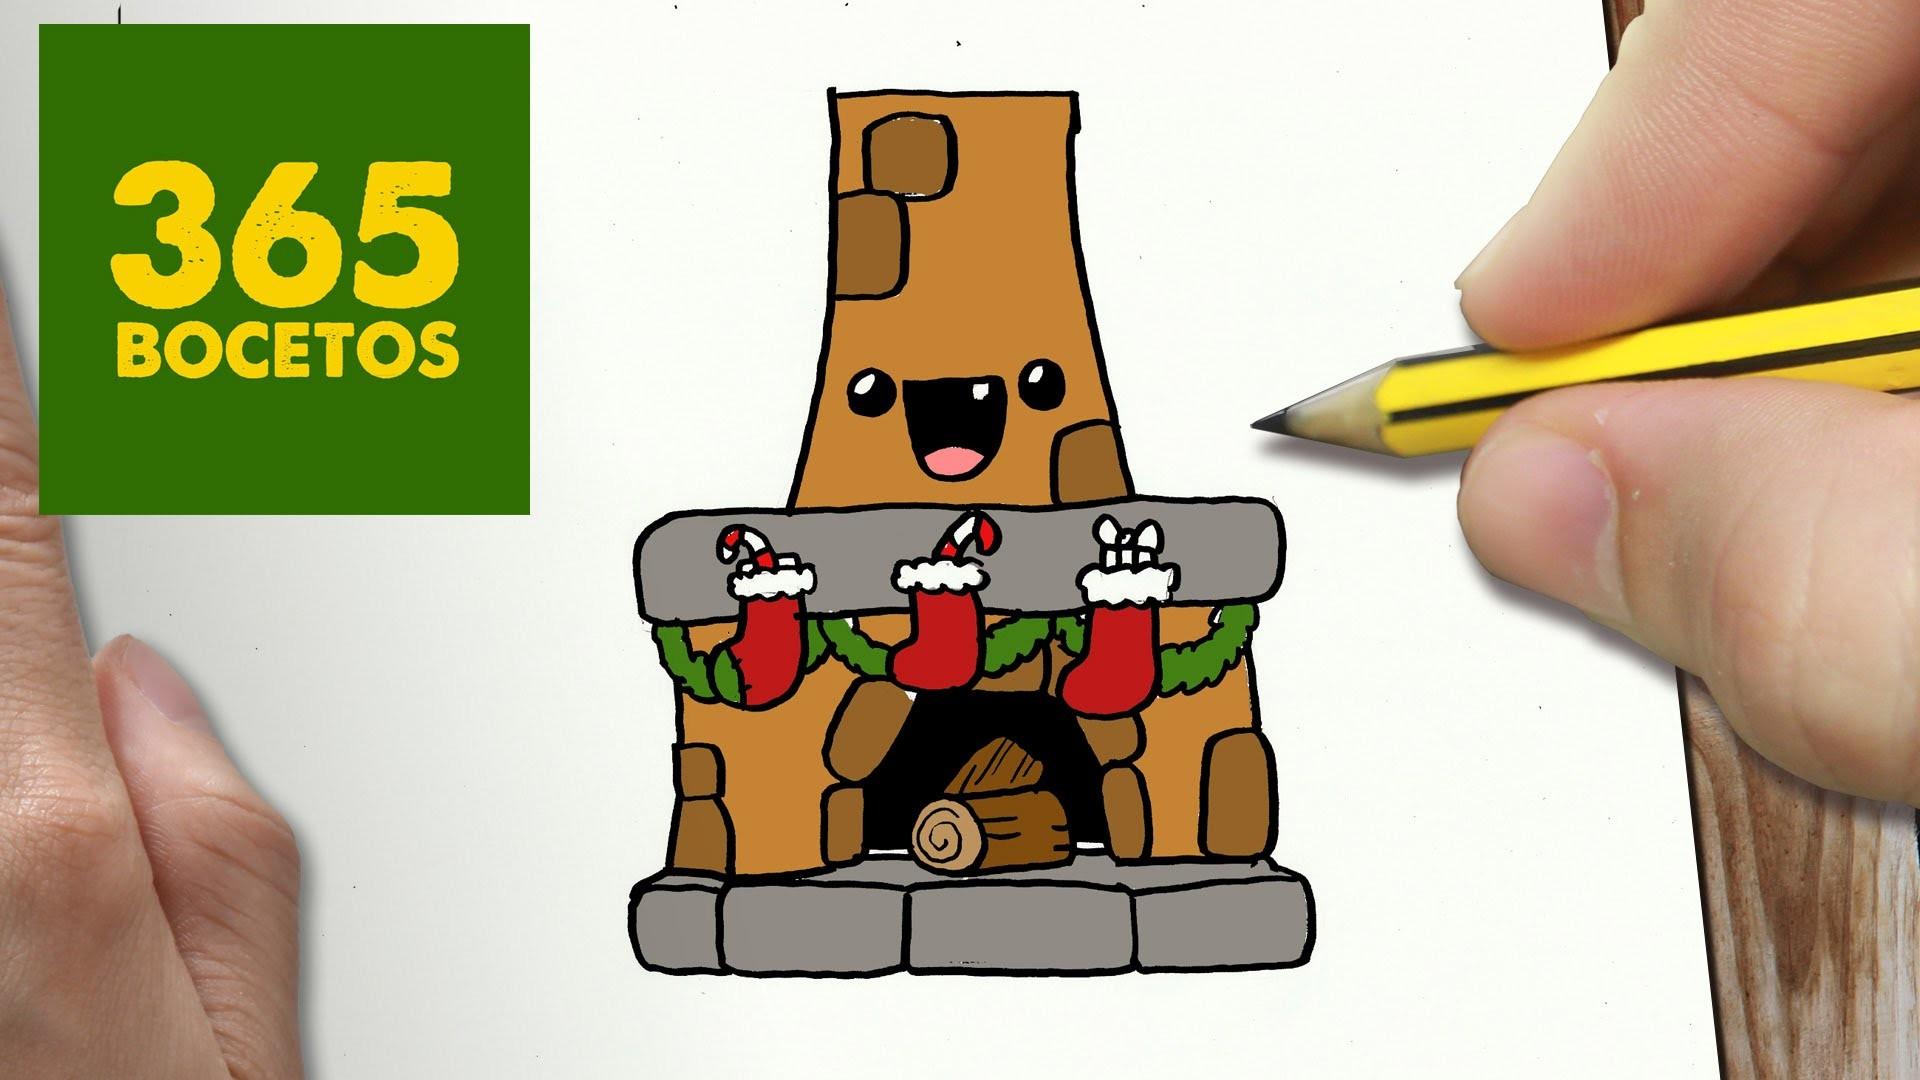 Como dibujar chimenea para navidad paso a paso dibujos - Dibujos de chimeneas de navidad ...